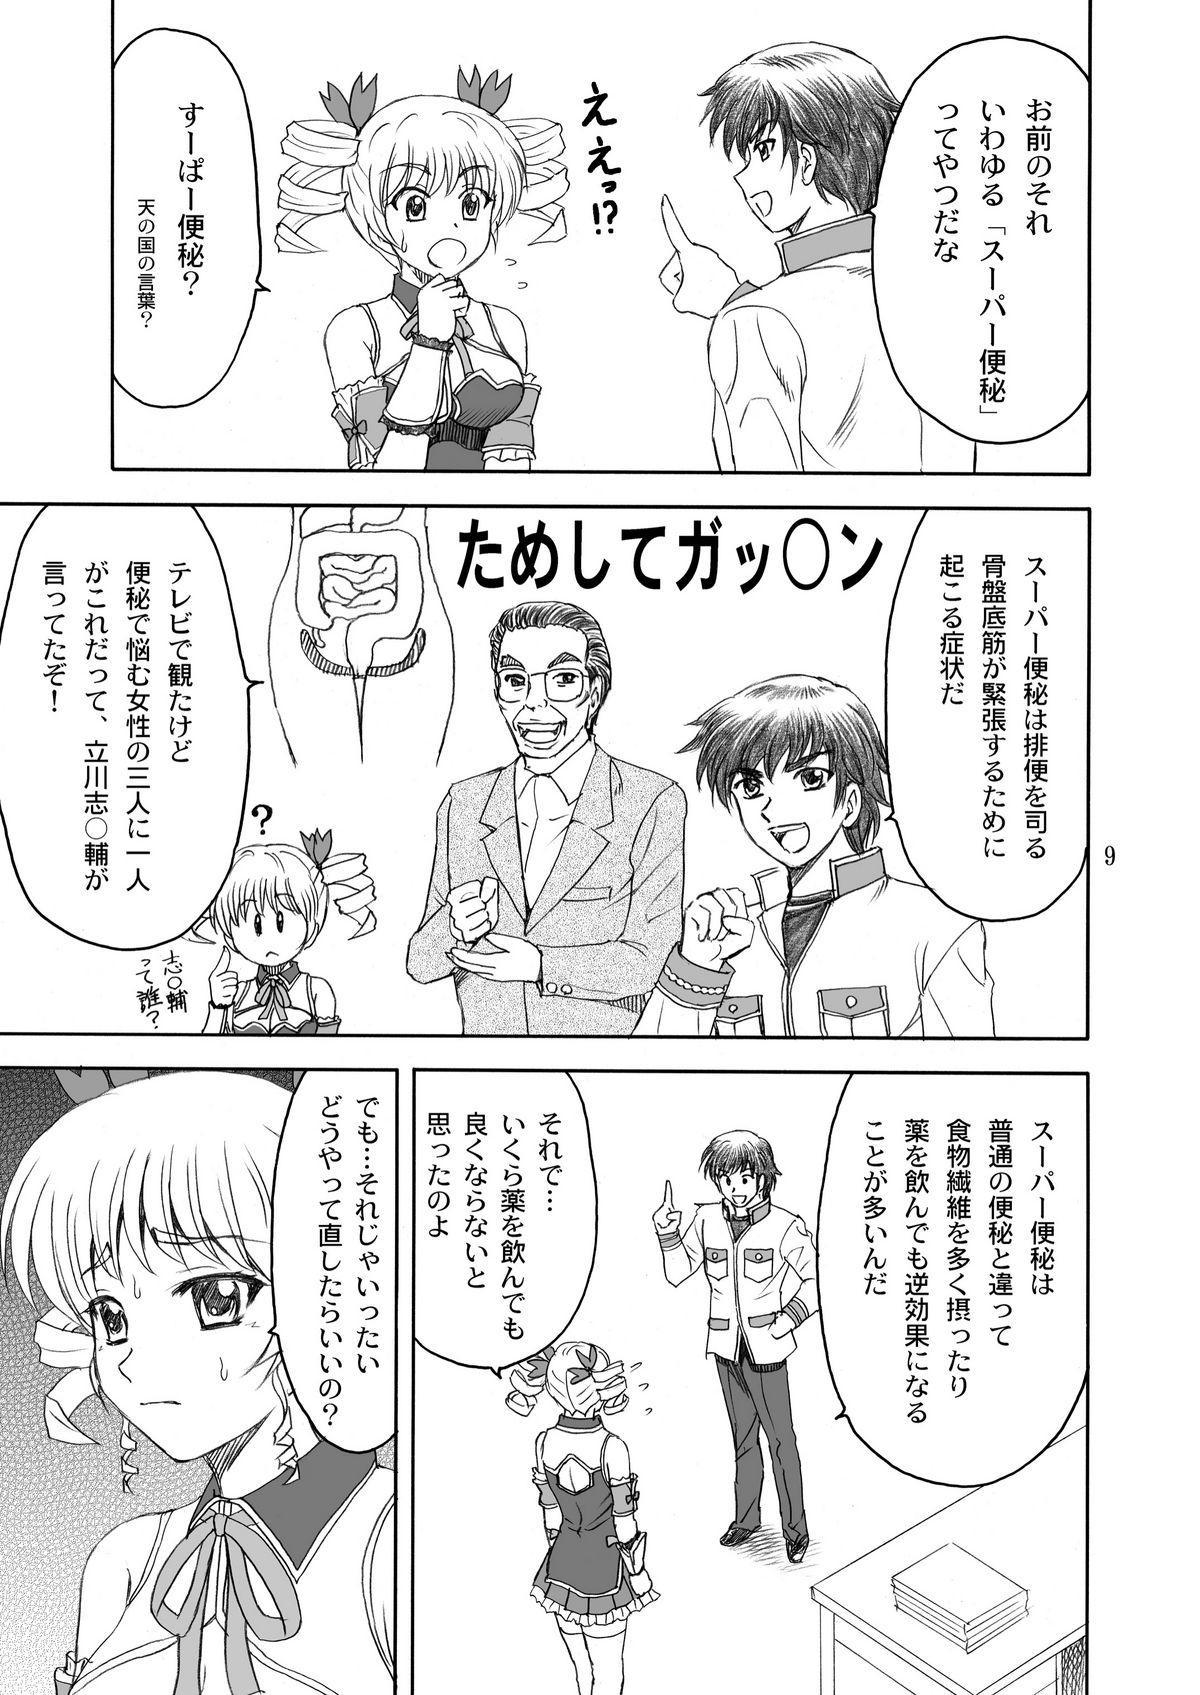 Karin-sama Otsuujiteki Jijou 8